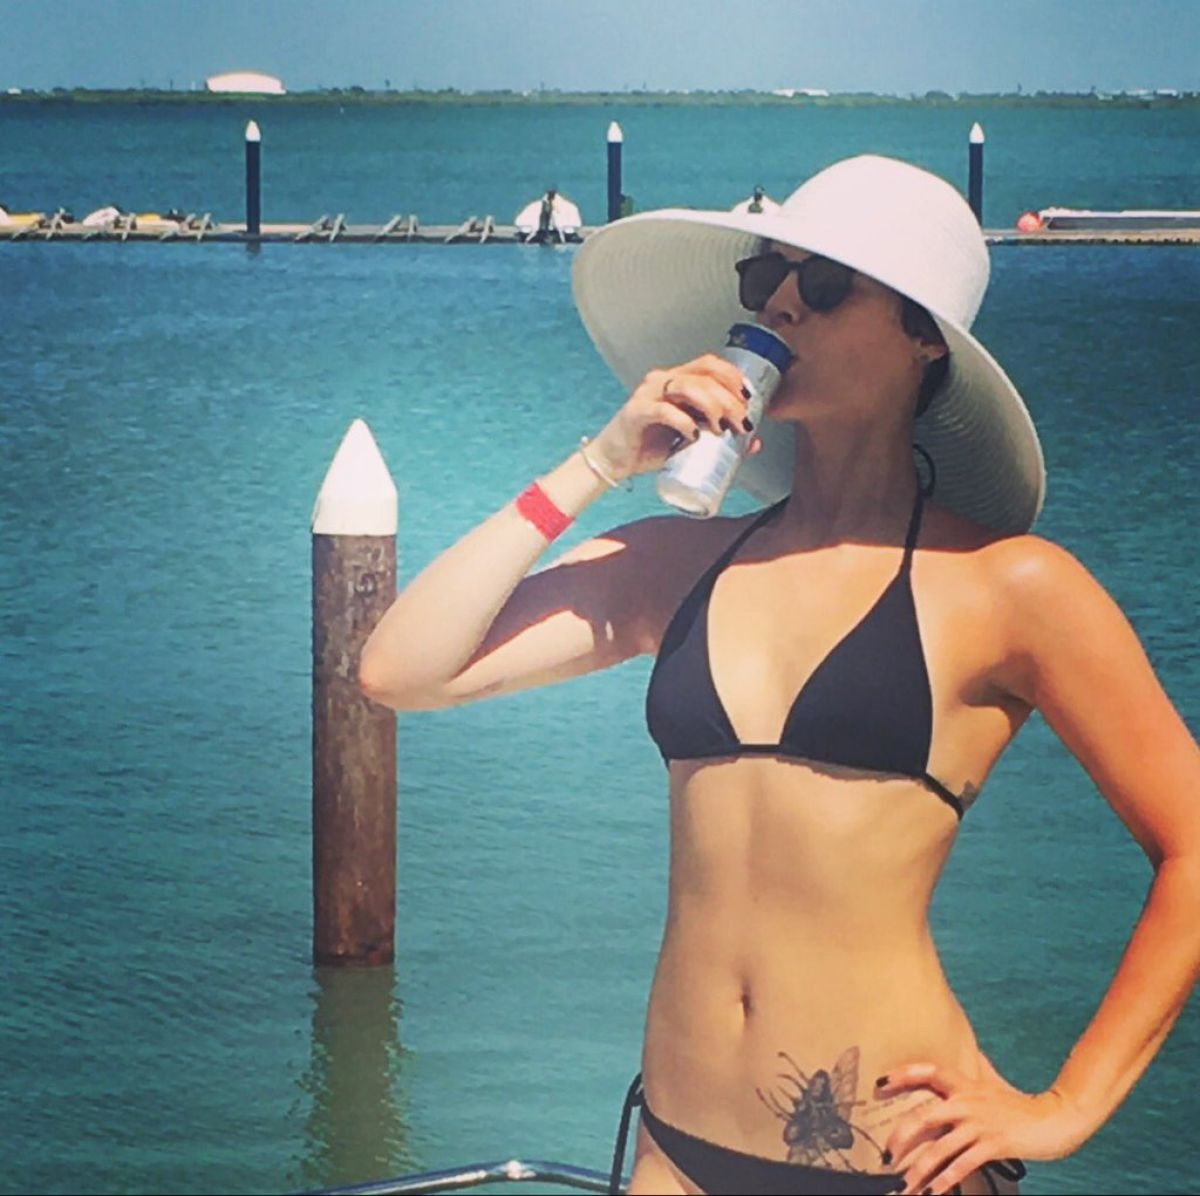 Bikini Jaimie Alexander naked (82 photo), Sexy, Bikini, Twitter, cameltoe 2020